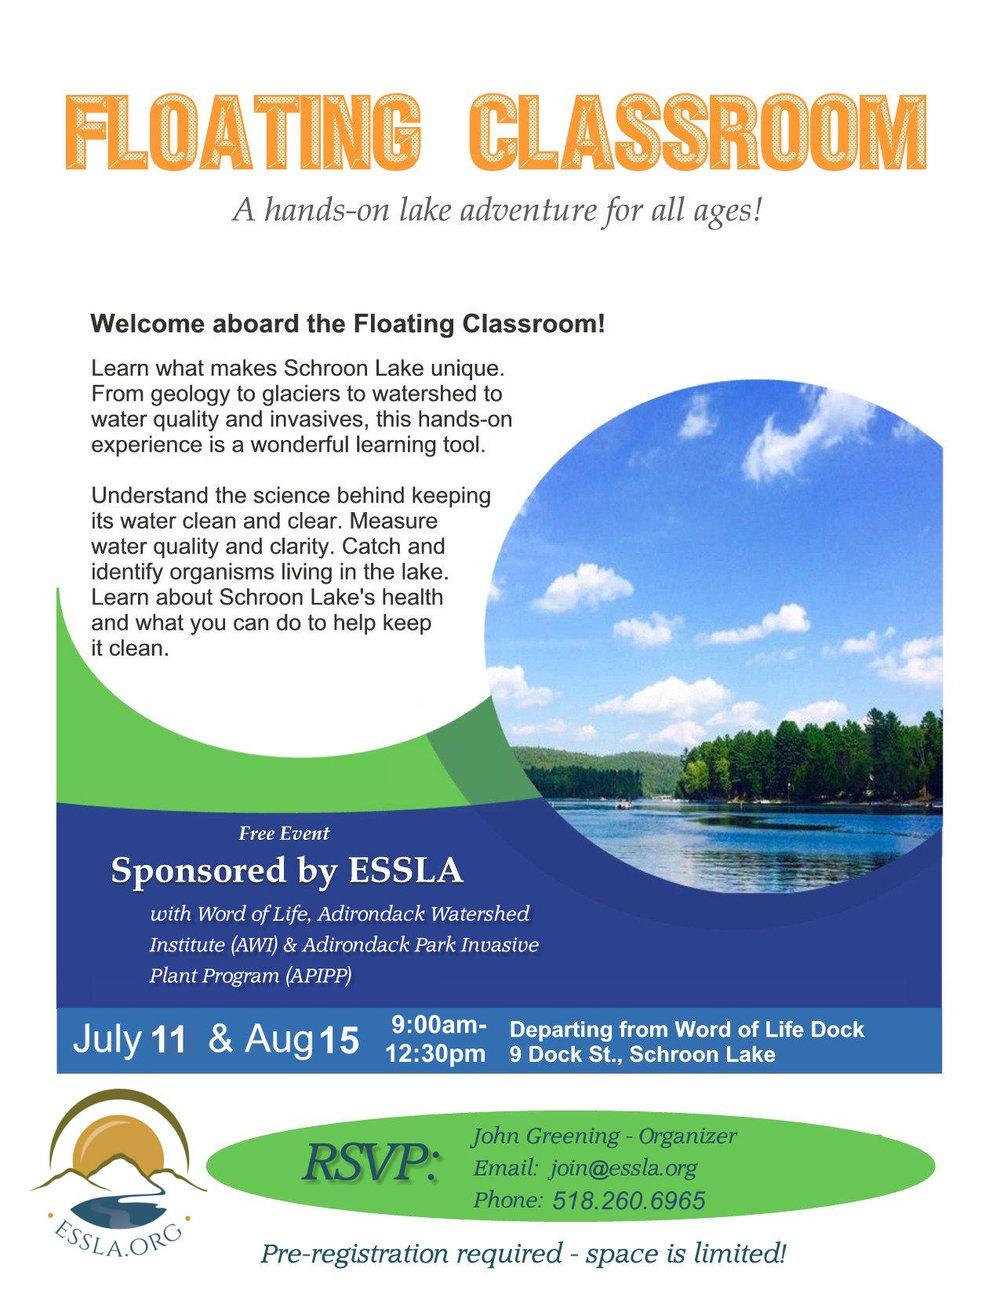 Floating-Classroom-Flyer-2018.jpg